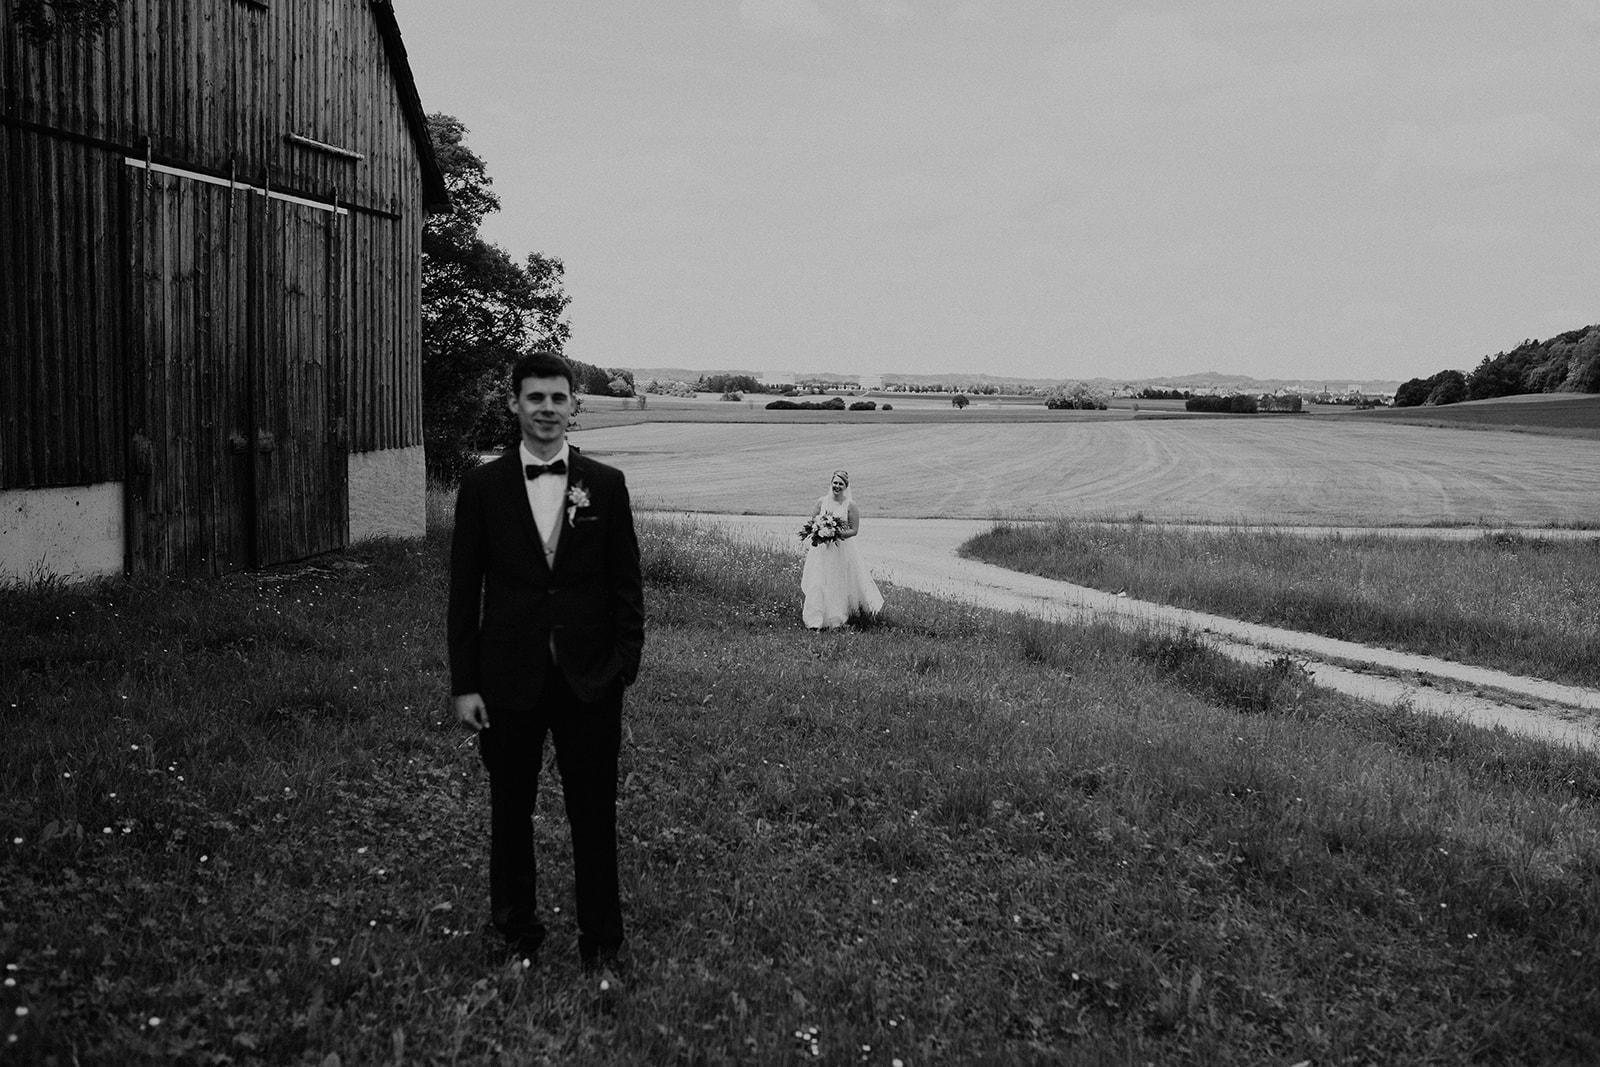 Christina___Julian_11_Hochzeitsfotograf_Craislheim.jpg